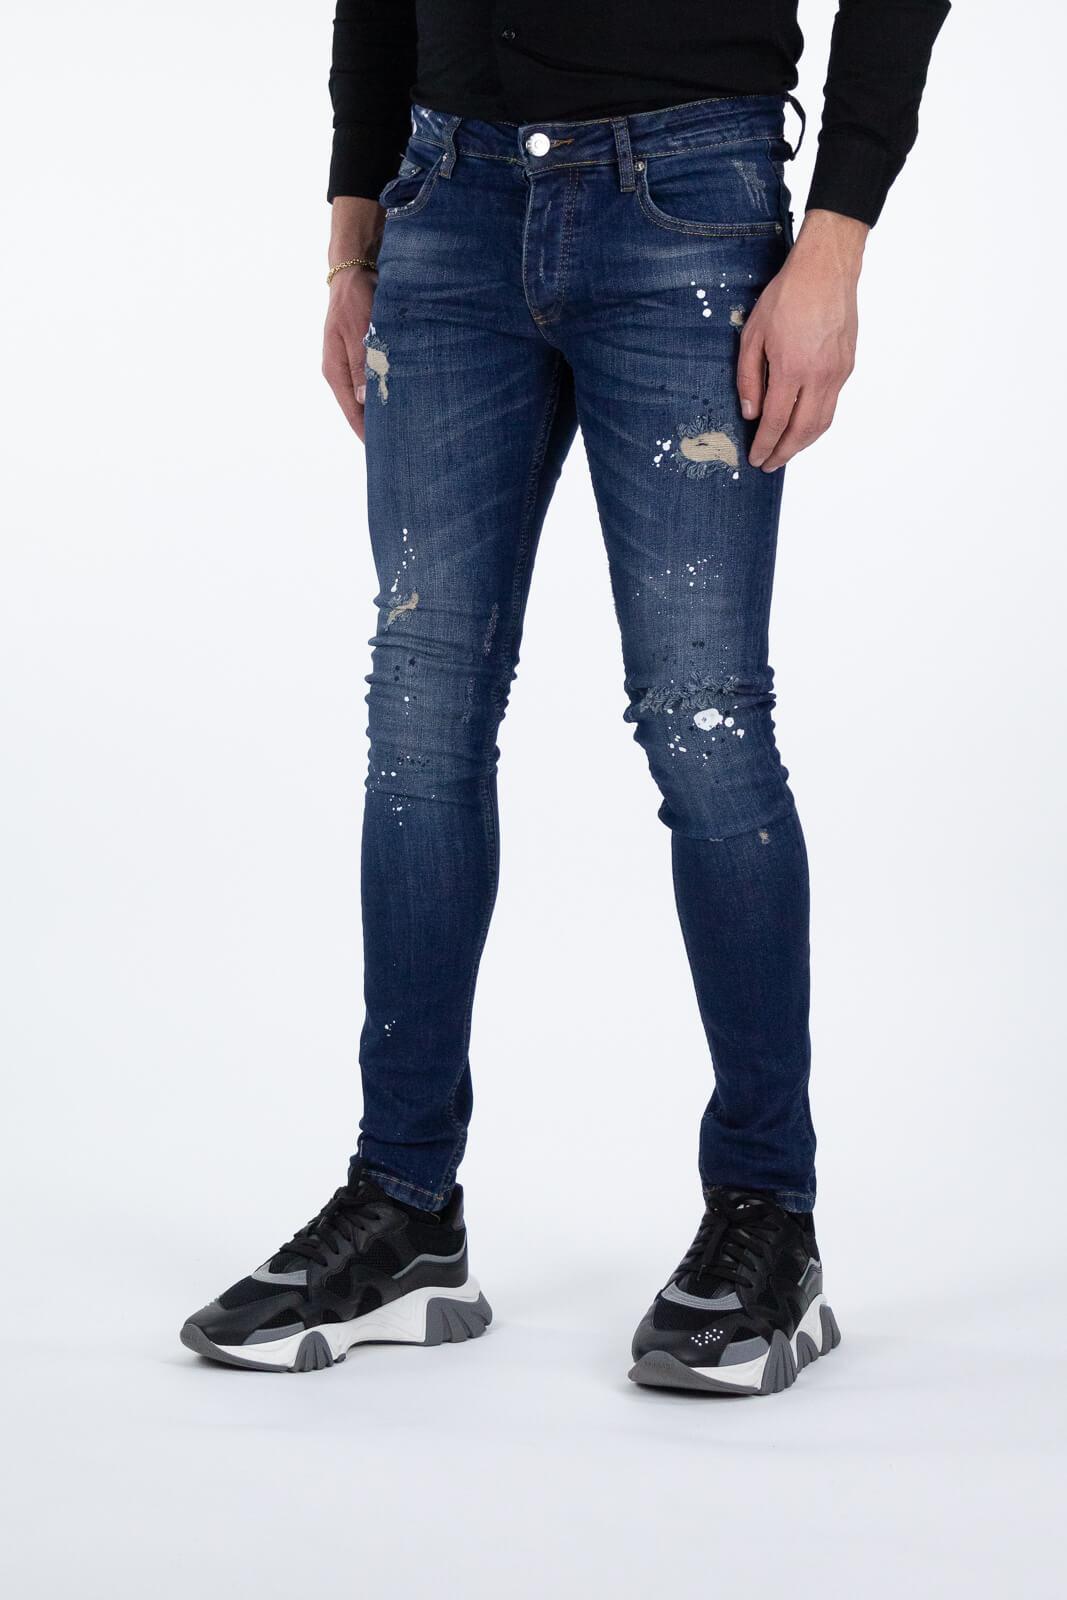 Piura Bleu Jeans-3